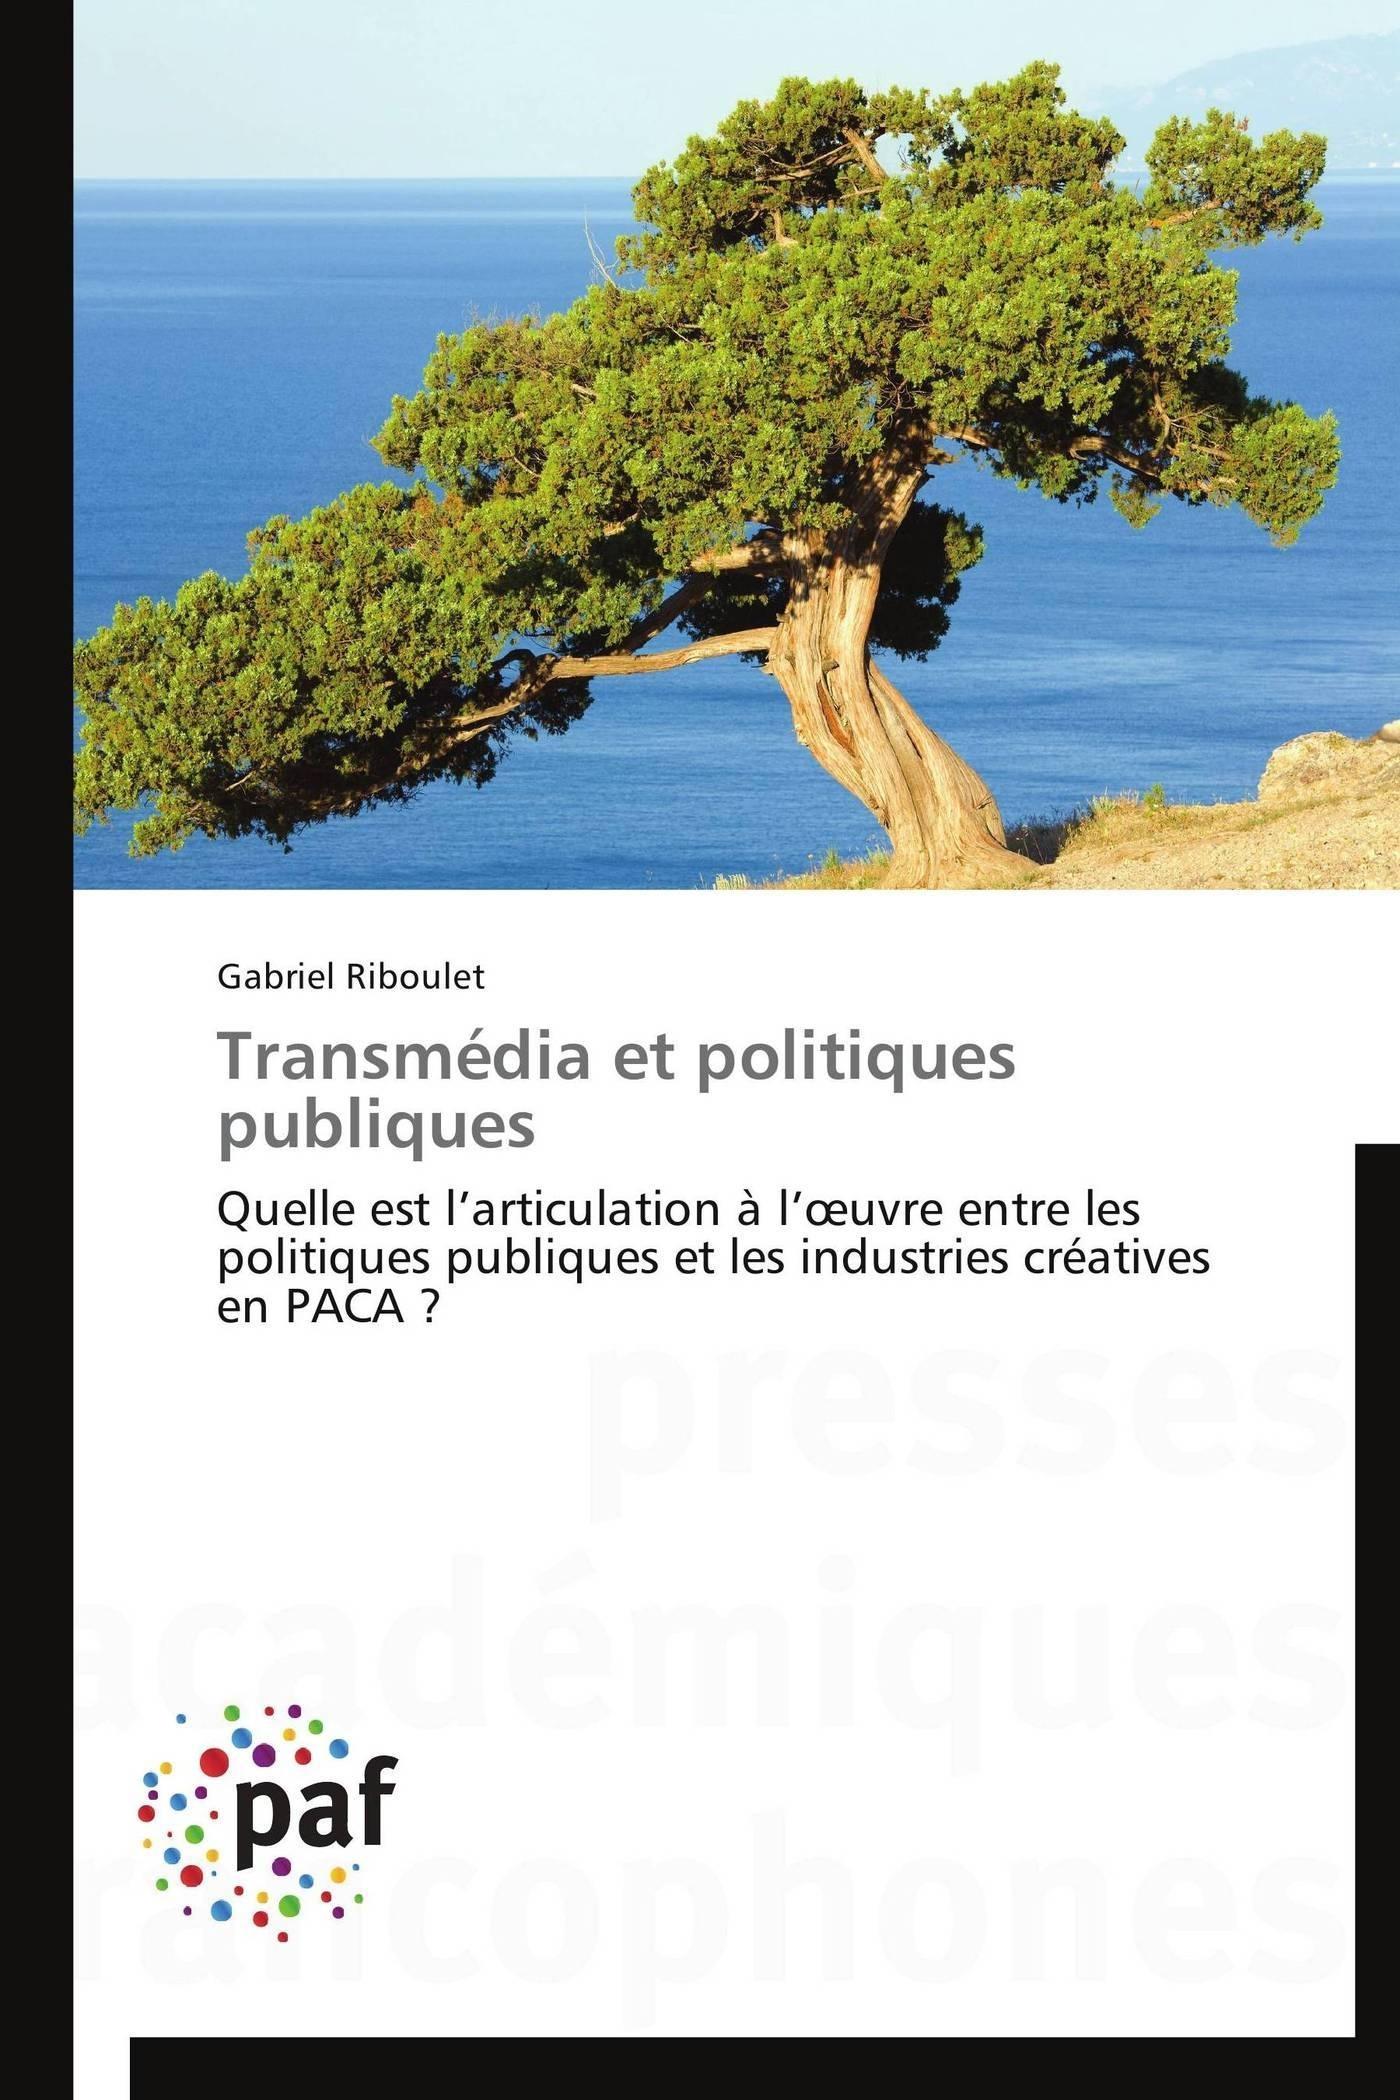 TRANSMEDIA ET POLITIQUES PUBLIQUES